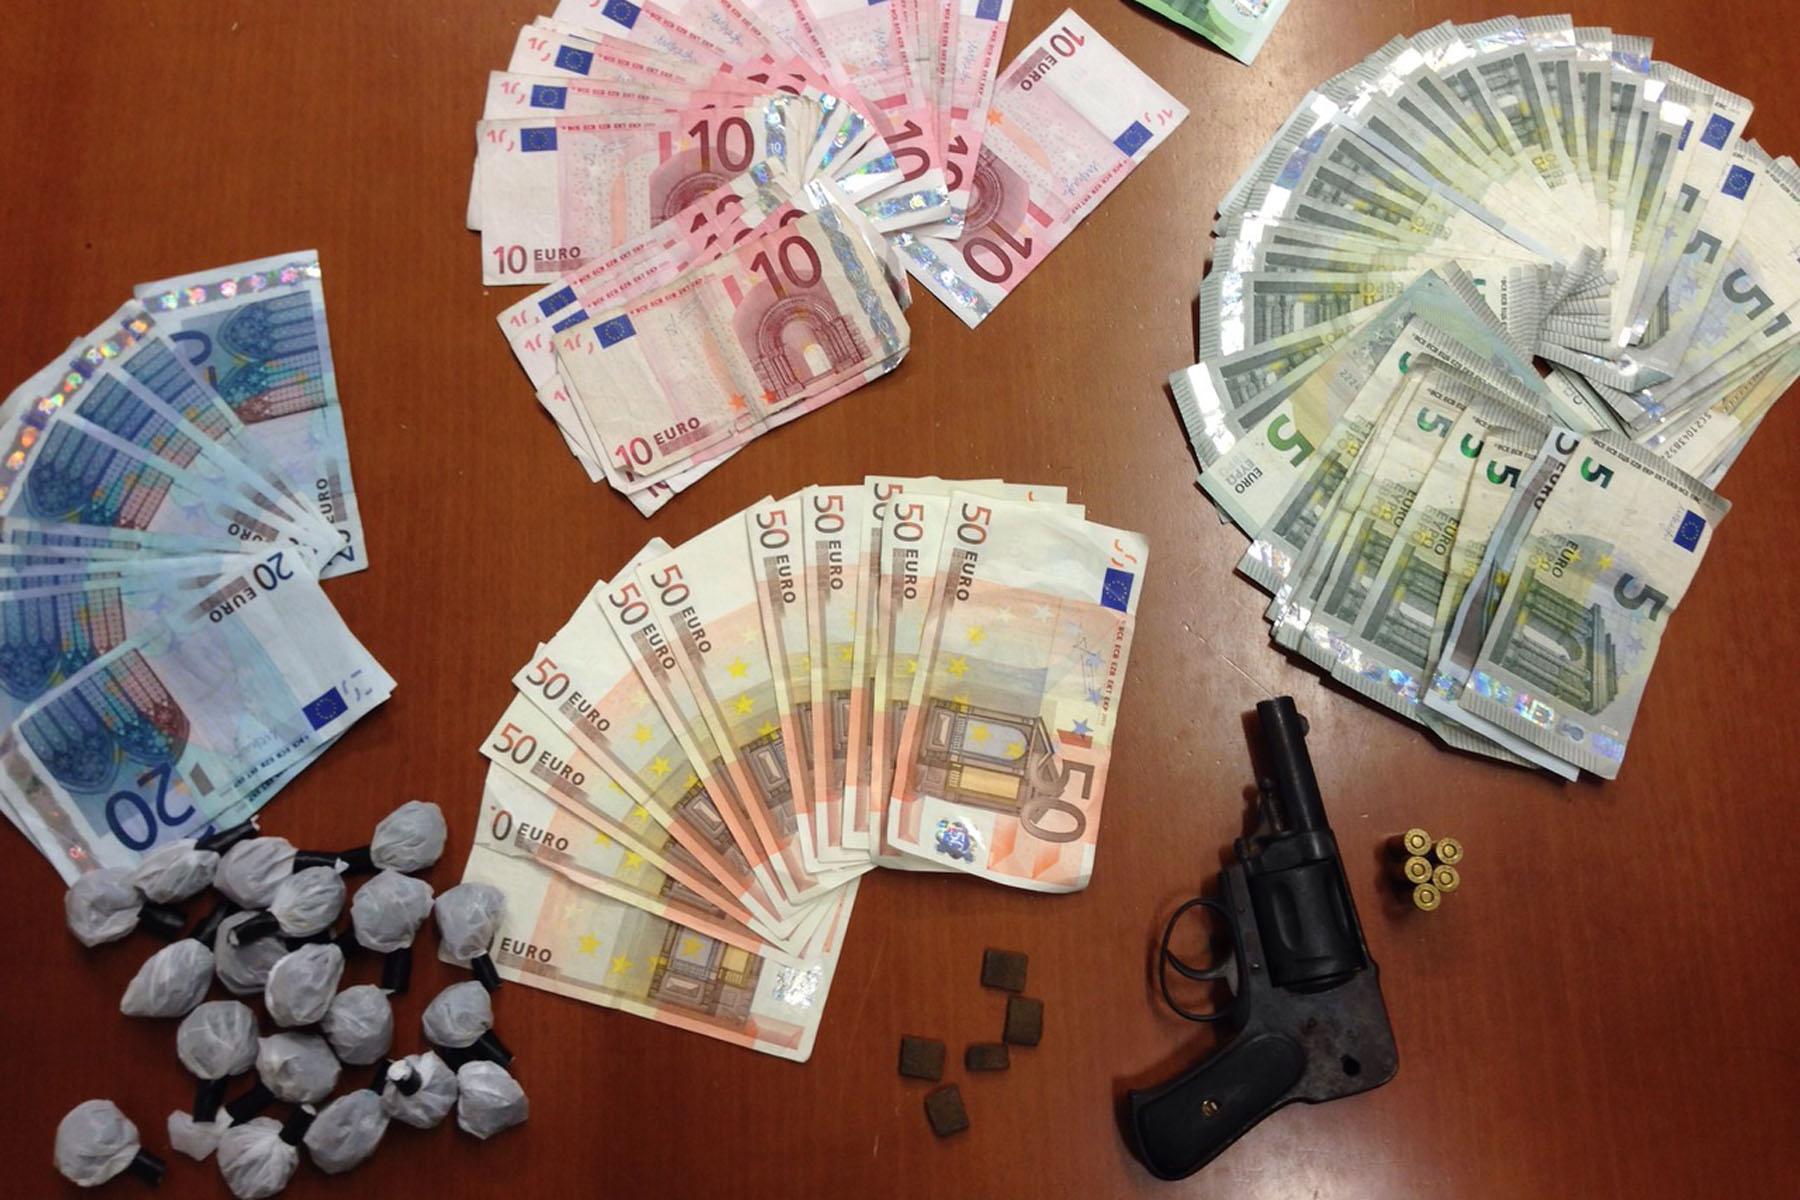 Arrestati spacciatori armati di revolver